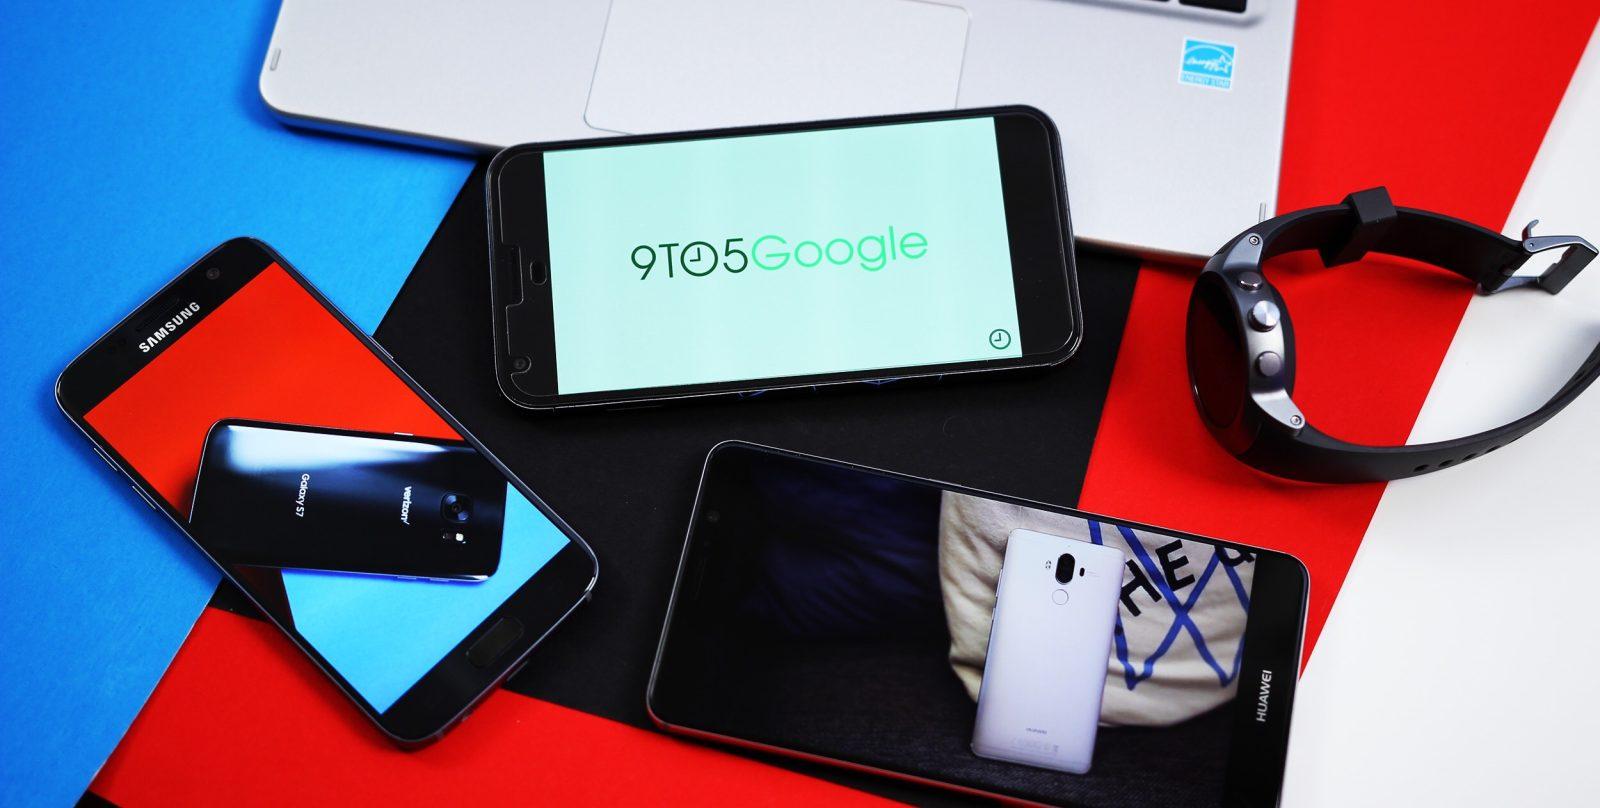 This week's top stories: ARKit vs  Google's Tango, new Fi